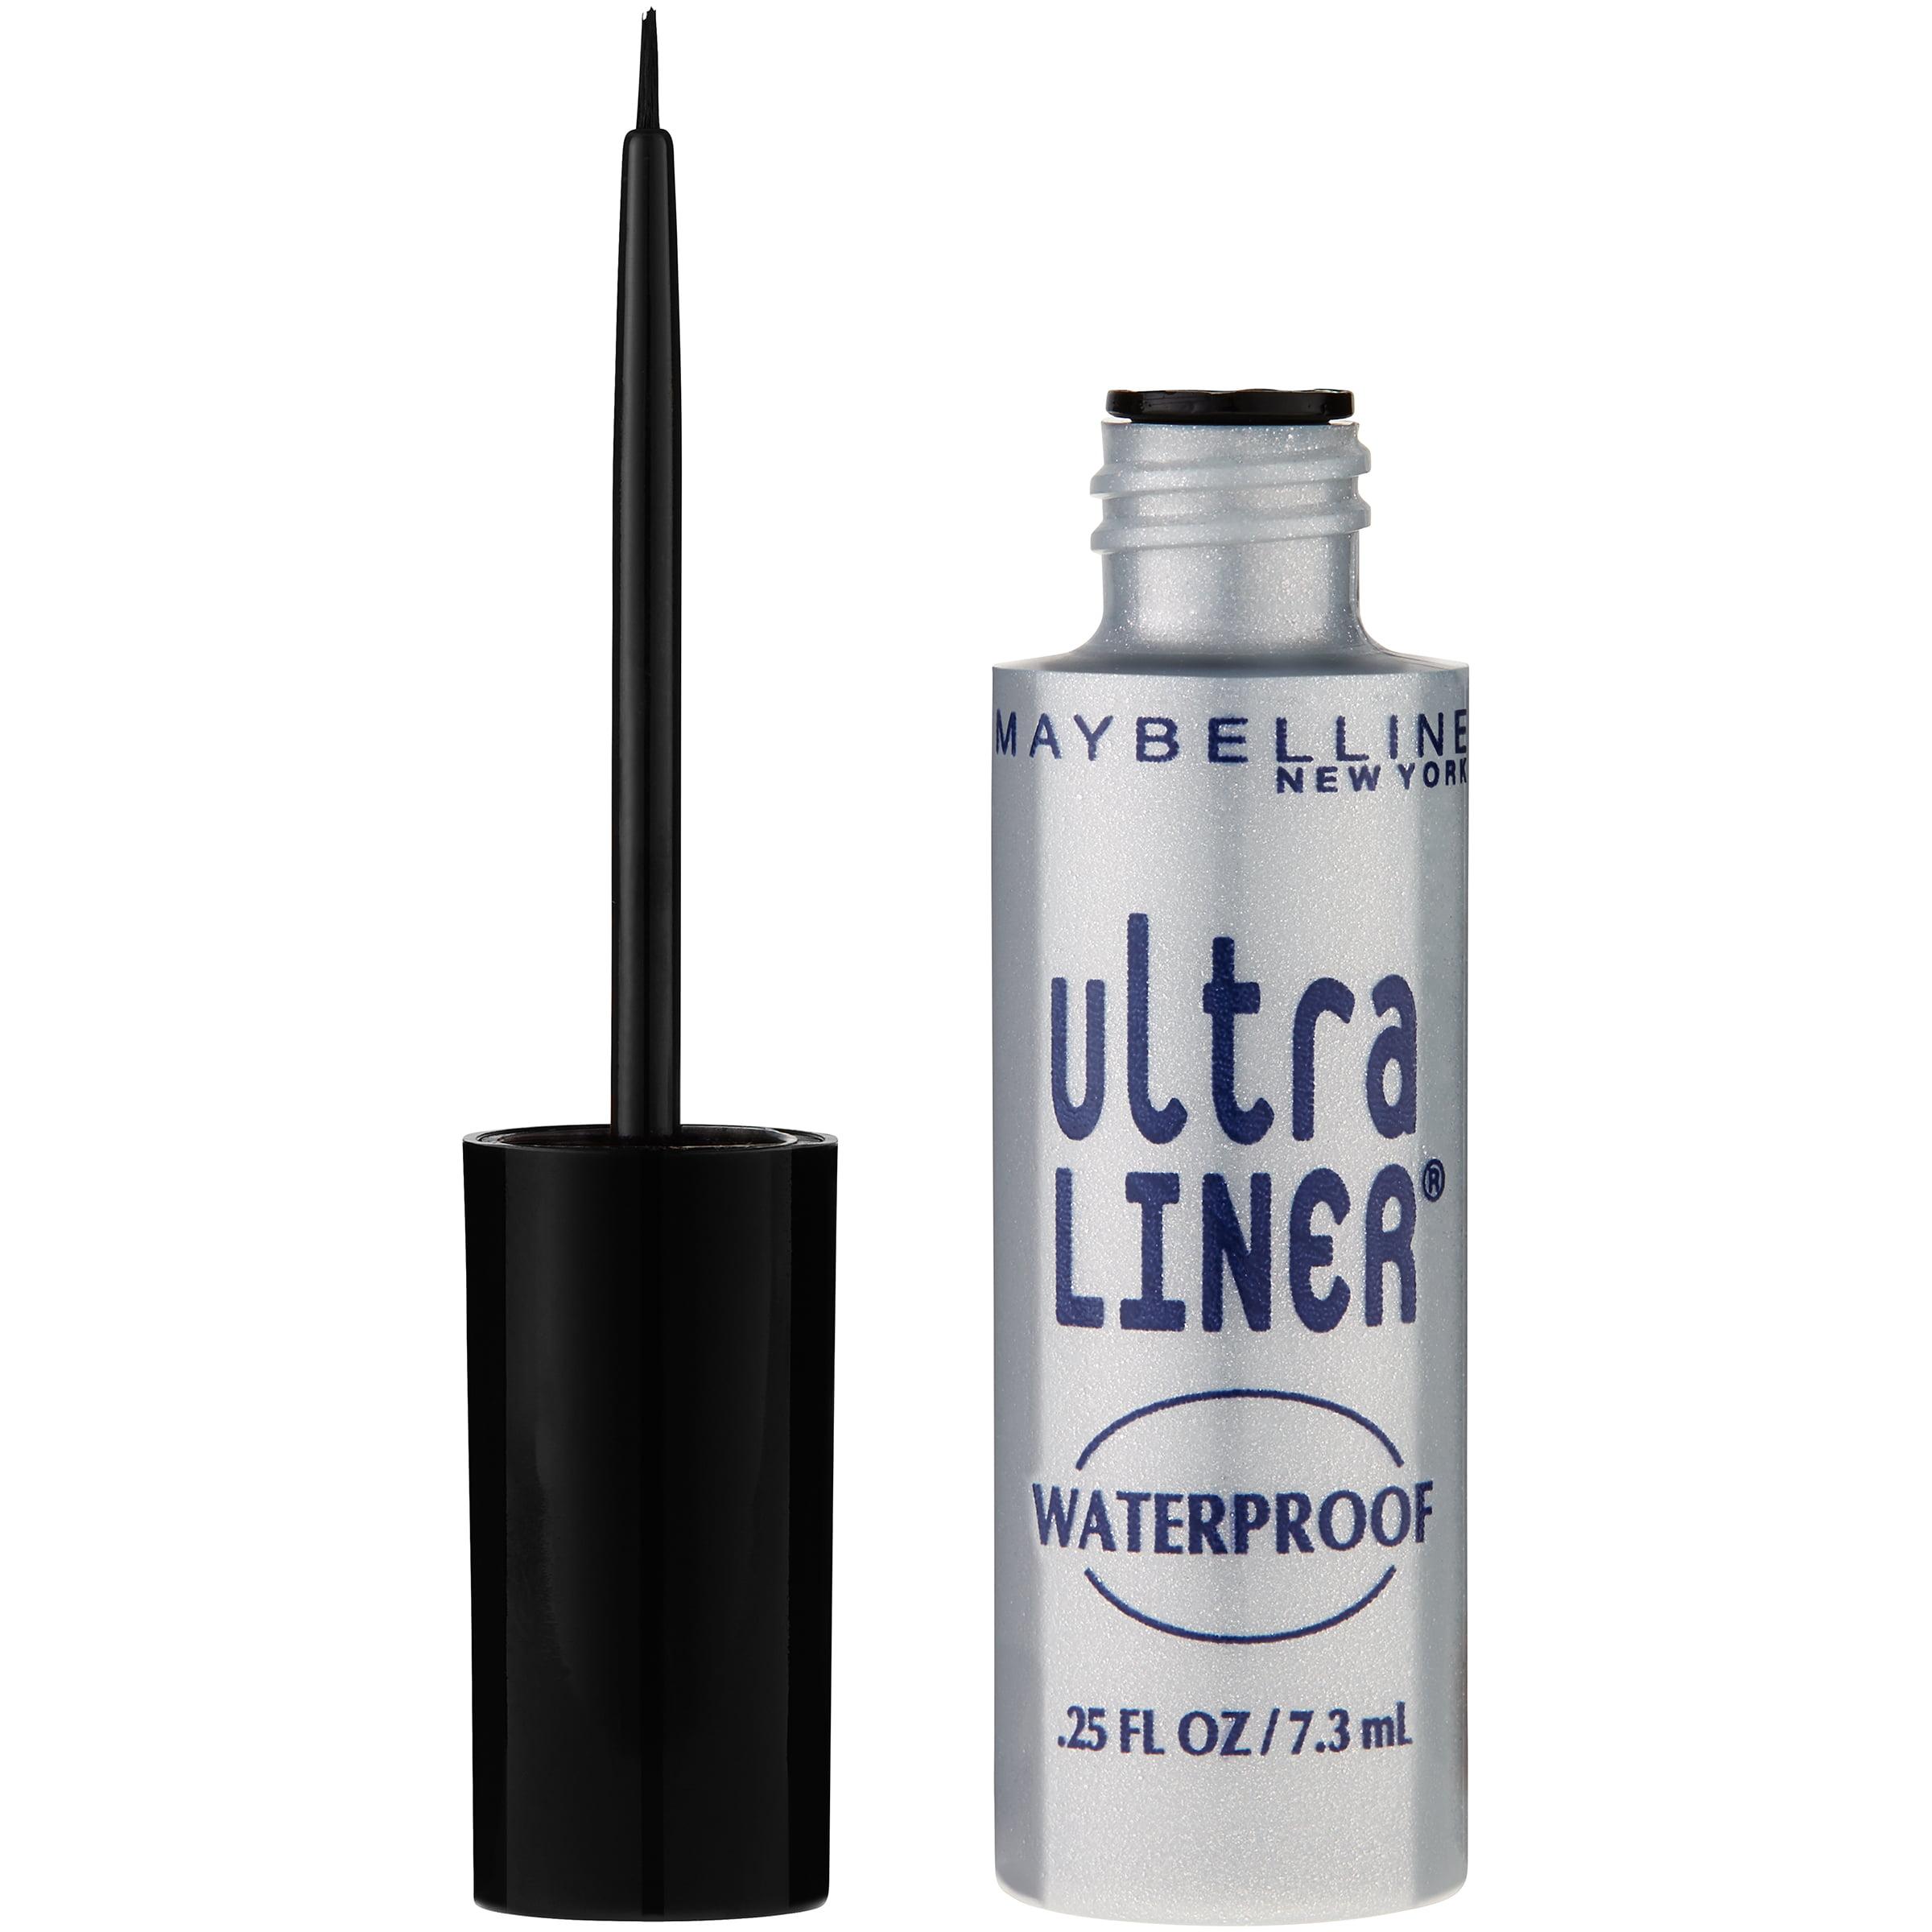 Maybelline New York Ultra Liner Waterproof Liquid Eyeliner